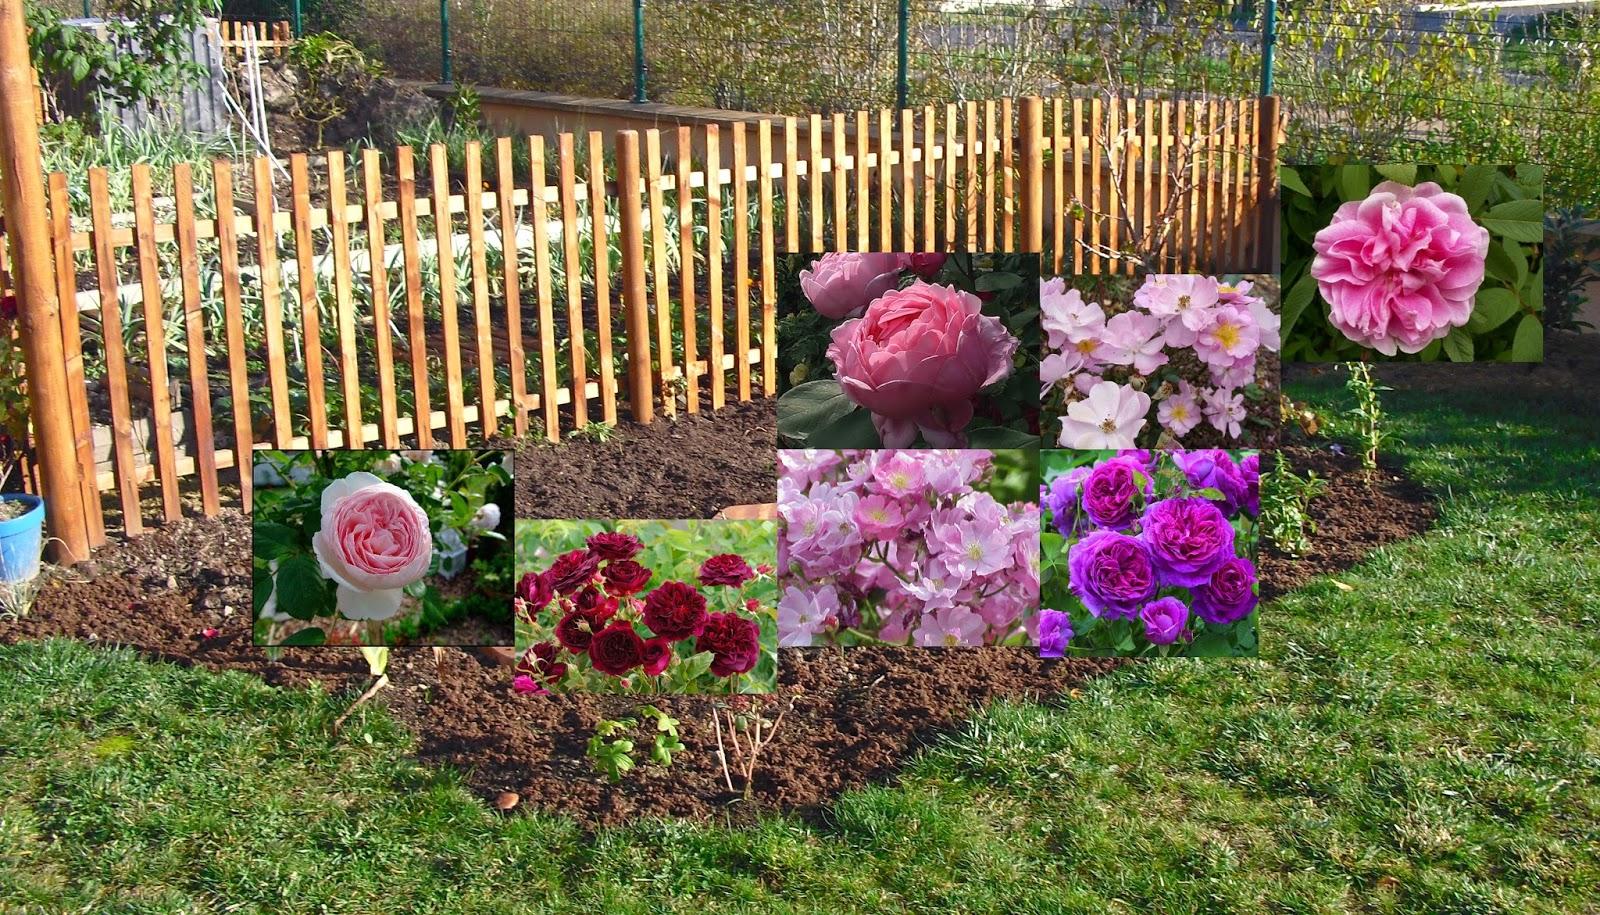 mon petit jardin en sologne les rosiers du massif invincibelle. Black Bedroom Furniture Sets. Home Design Ideas